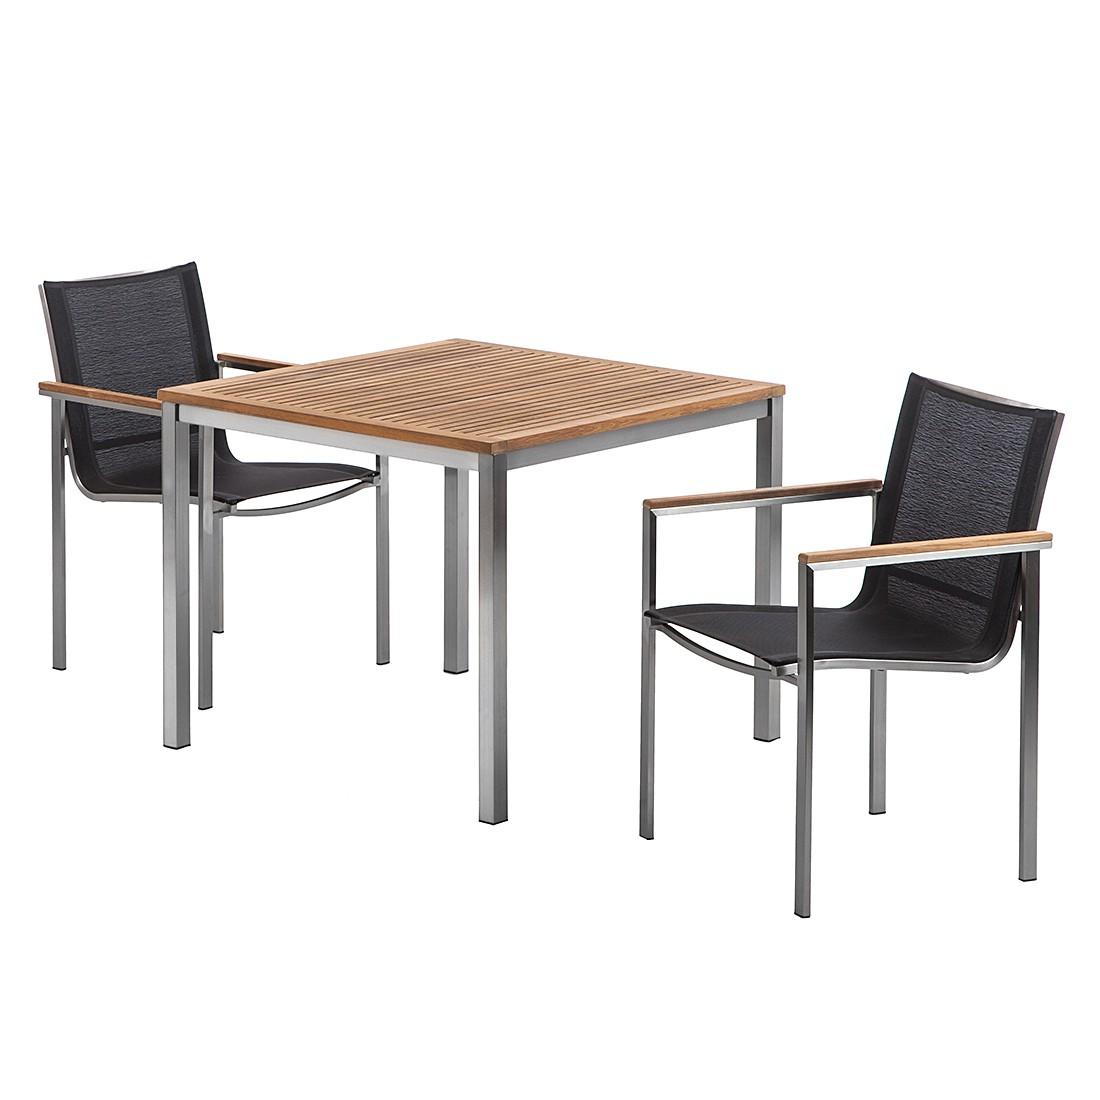 Tischgruppe Teak Line Vari I (3-teilig) – Teakholz/Edelstahl, King's Garden jetzt kaufen